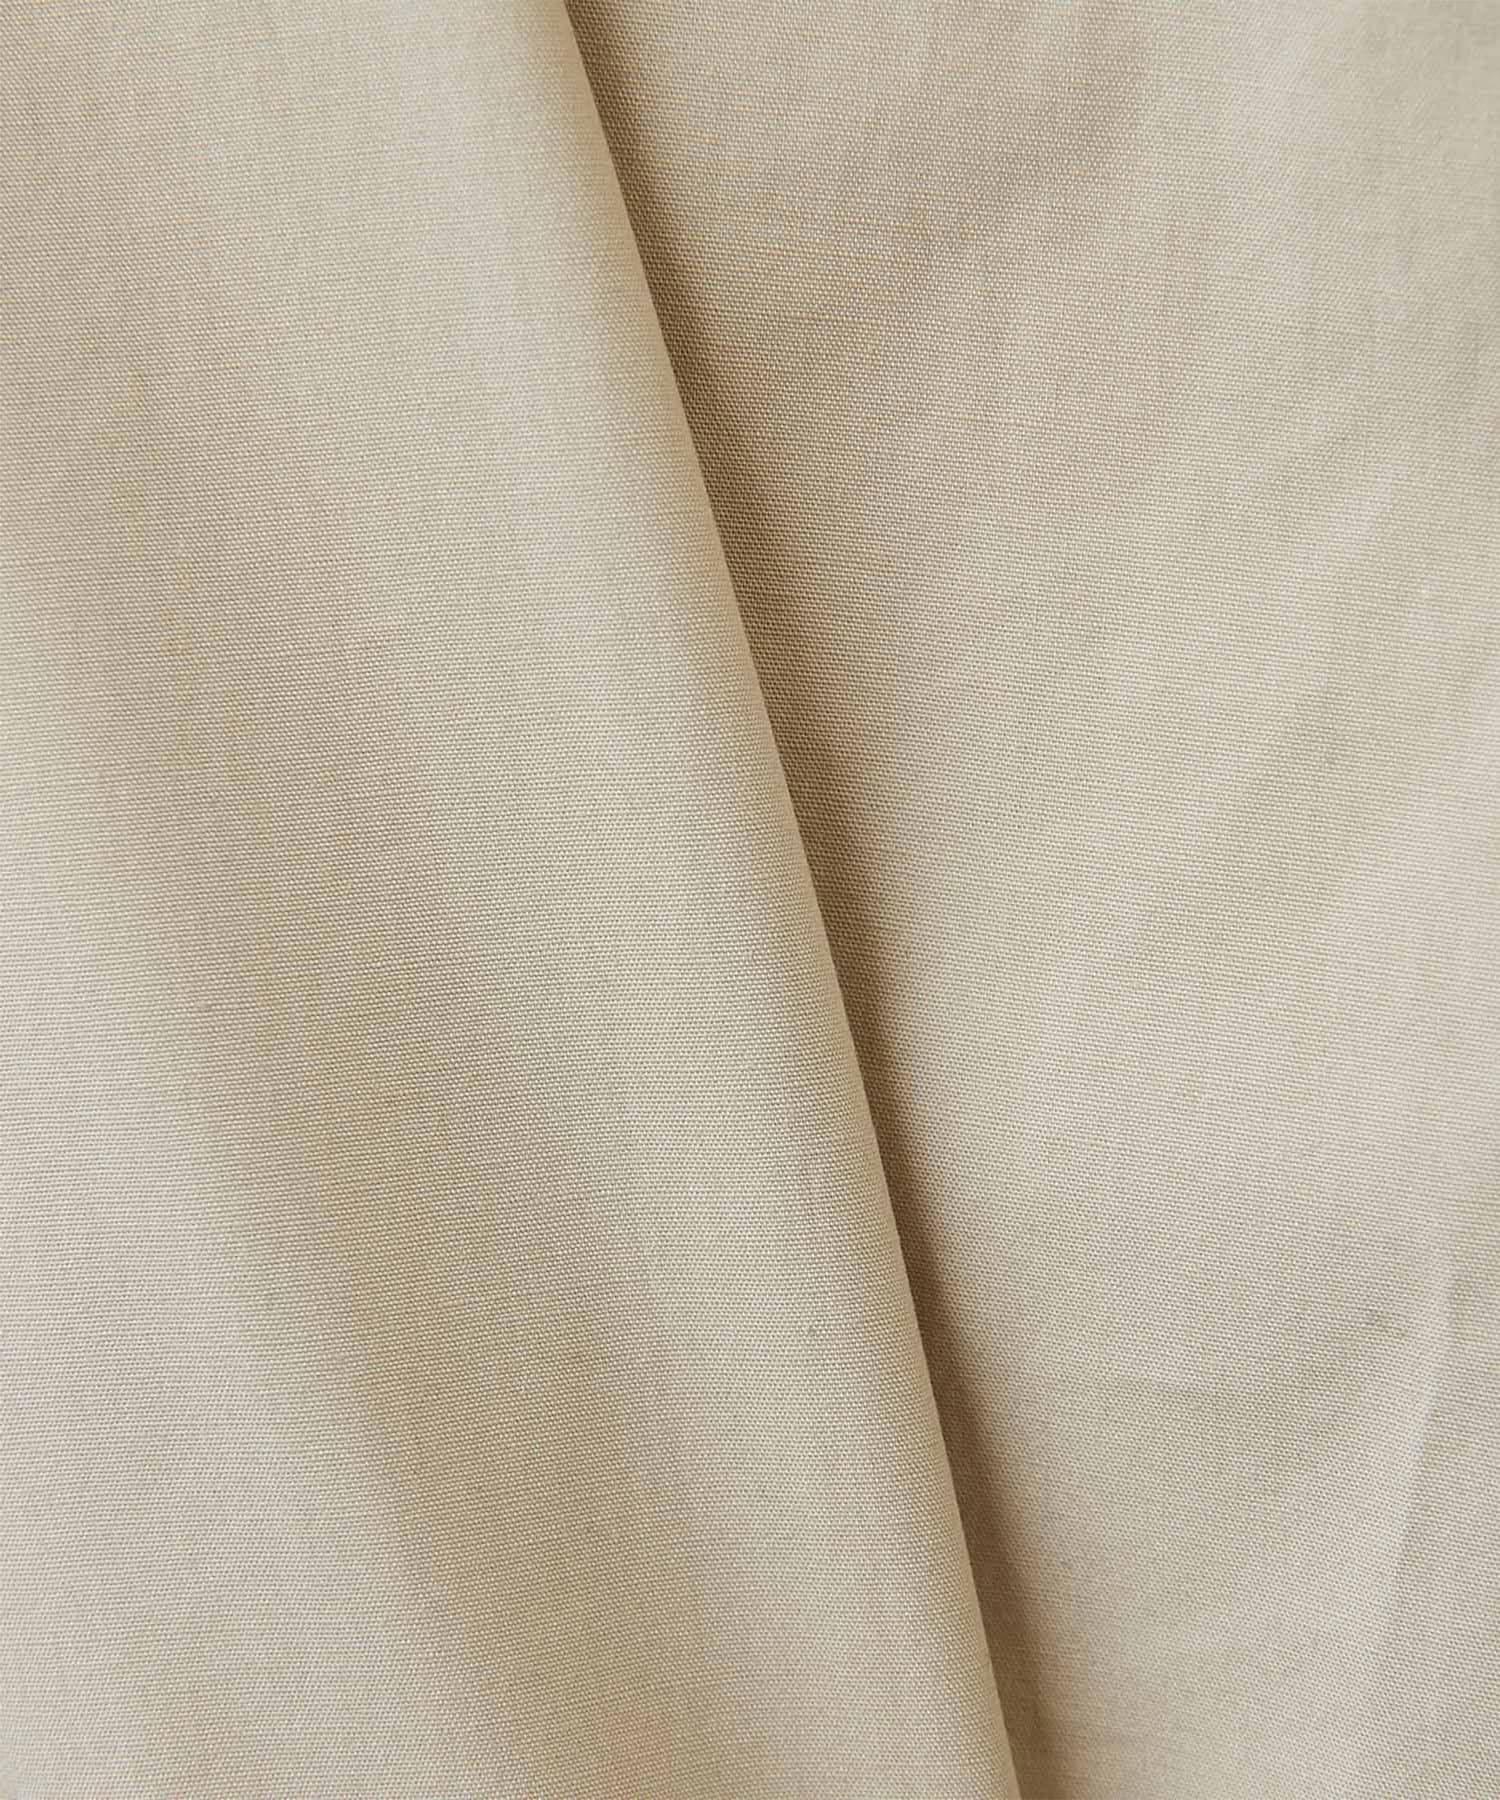 GALLARDAGALANTE(ガリャルダガランテ) ドルマンシャツワンピース【オンラインストア限定商品】